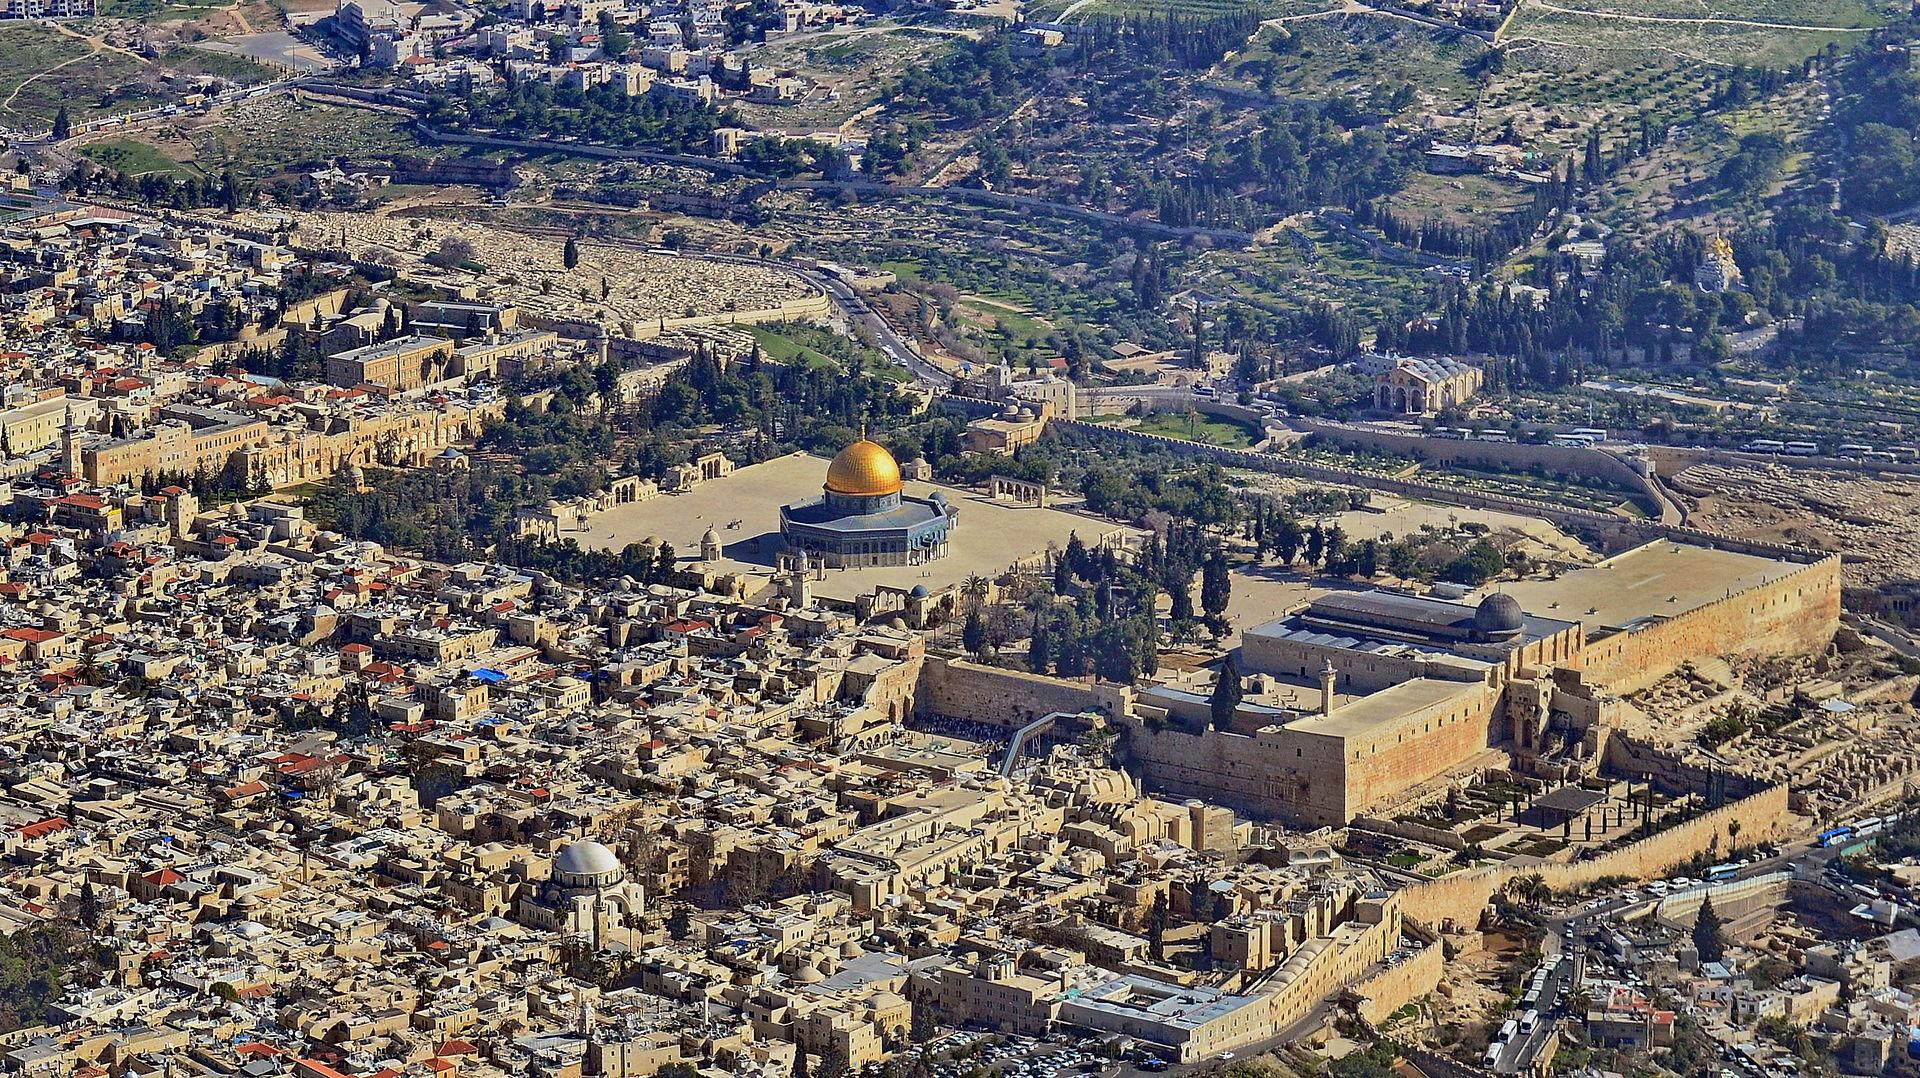 De Oude Stad van Jeruzalem. Foto: Avraham Graicer/Wikimedia Commons